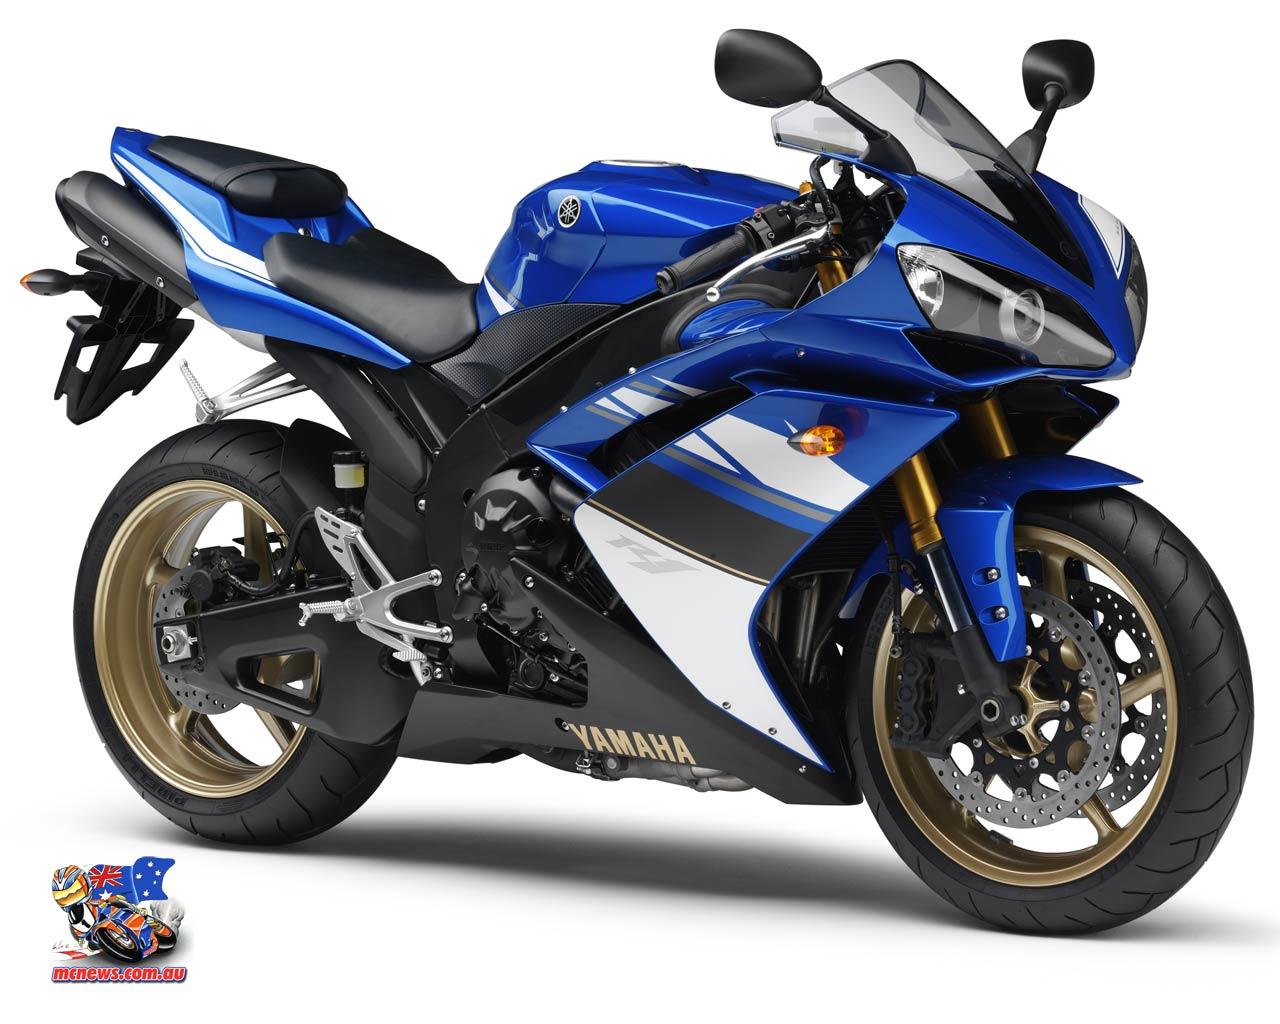 Yamaha R1 Wallpaper 13724 Hd Wallpapers in Bikes   Imagescicom 1280x1024